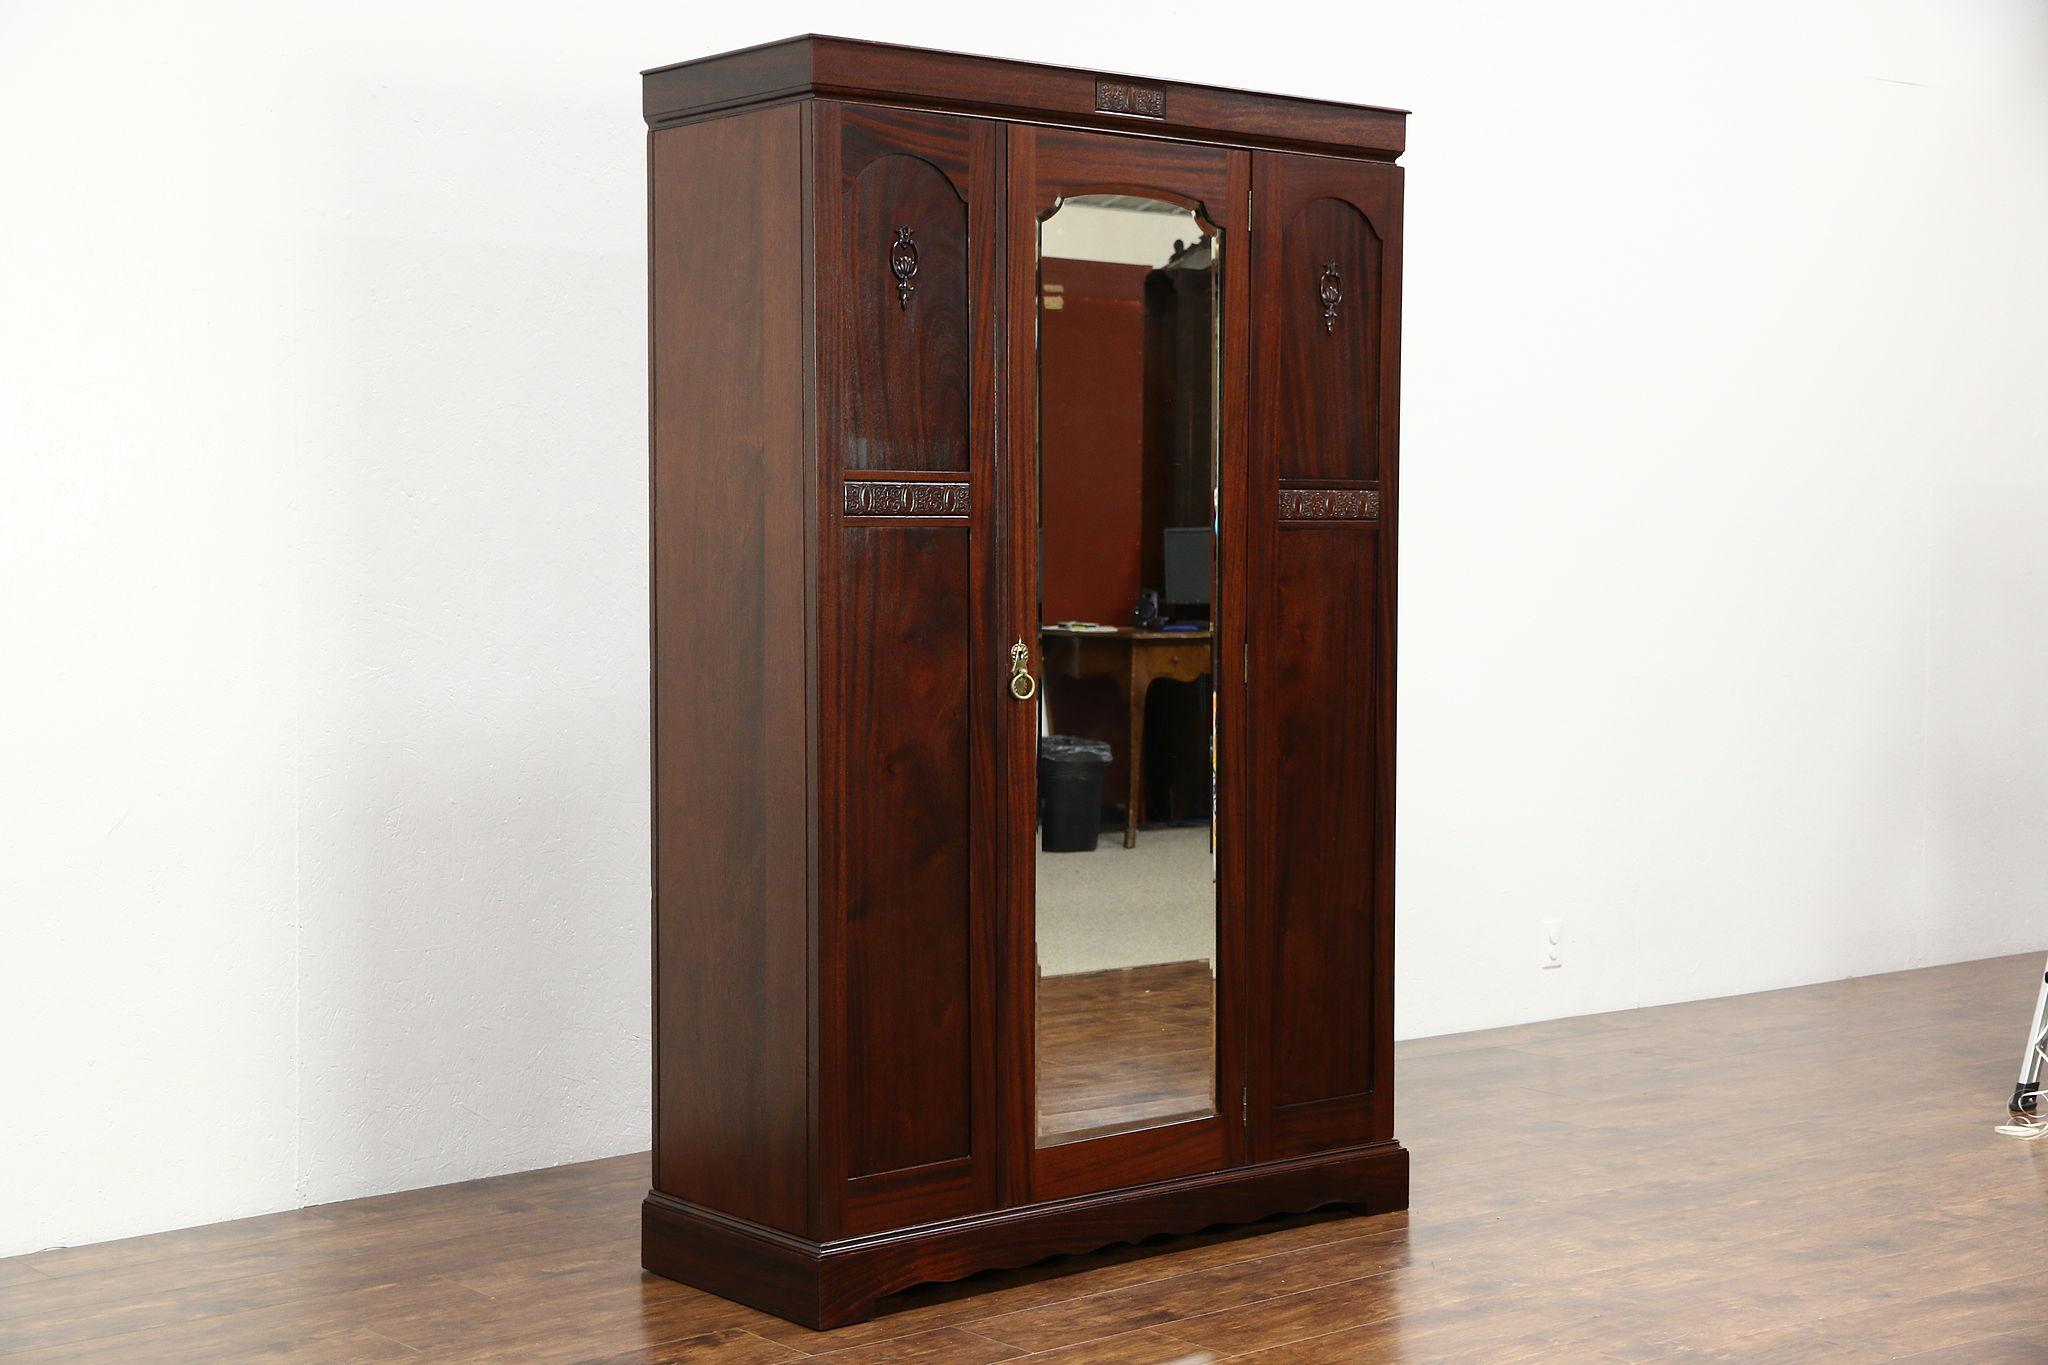 SOLD - English 1910 Antique Armoire, Wardrobe or Closet ...